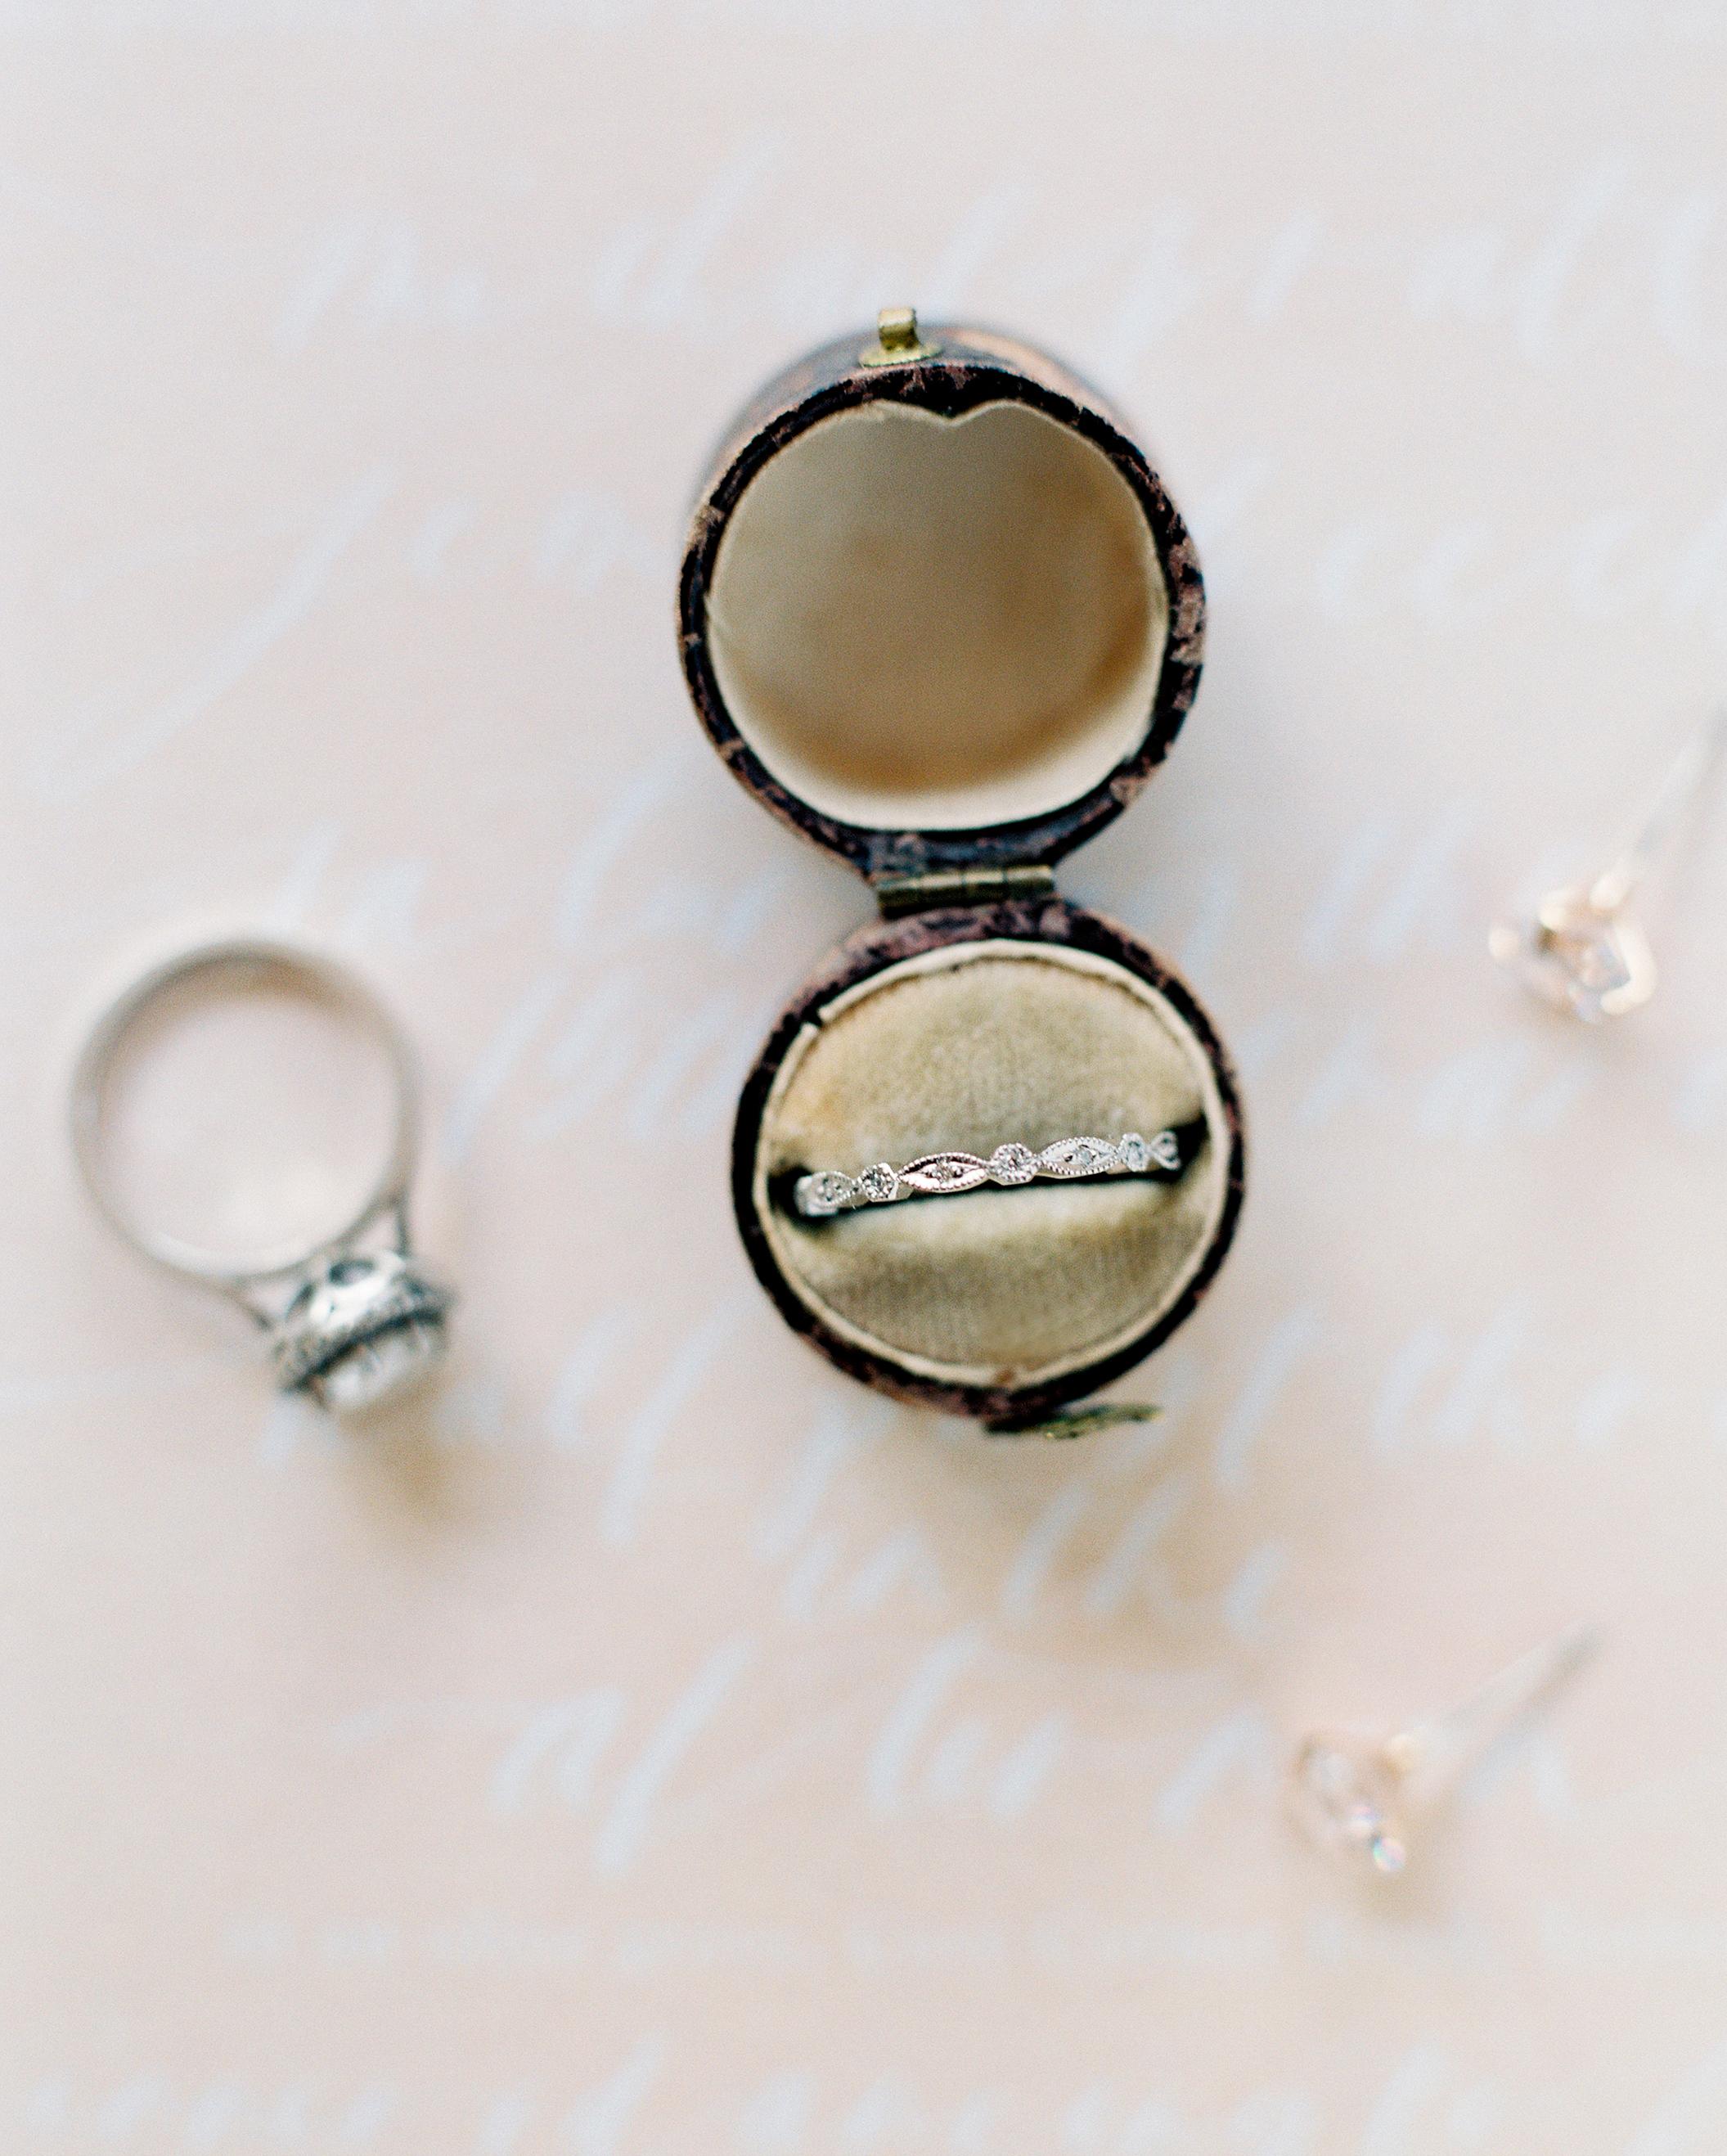 jemma-michael-wedding-rings-002635012-s112110-0815.jpg